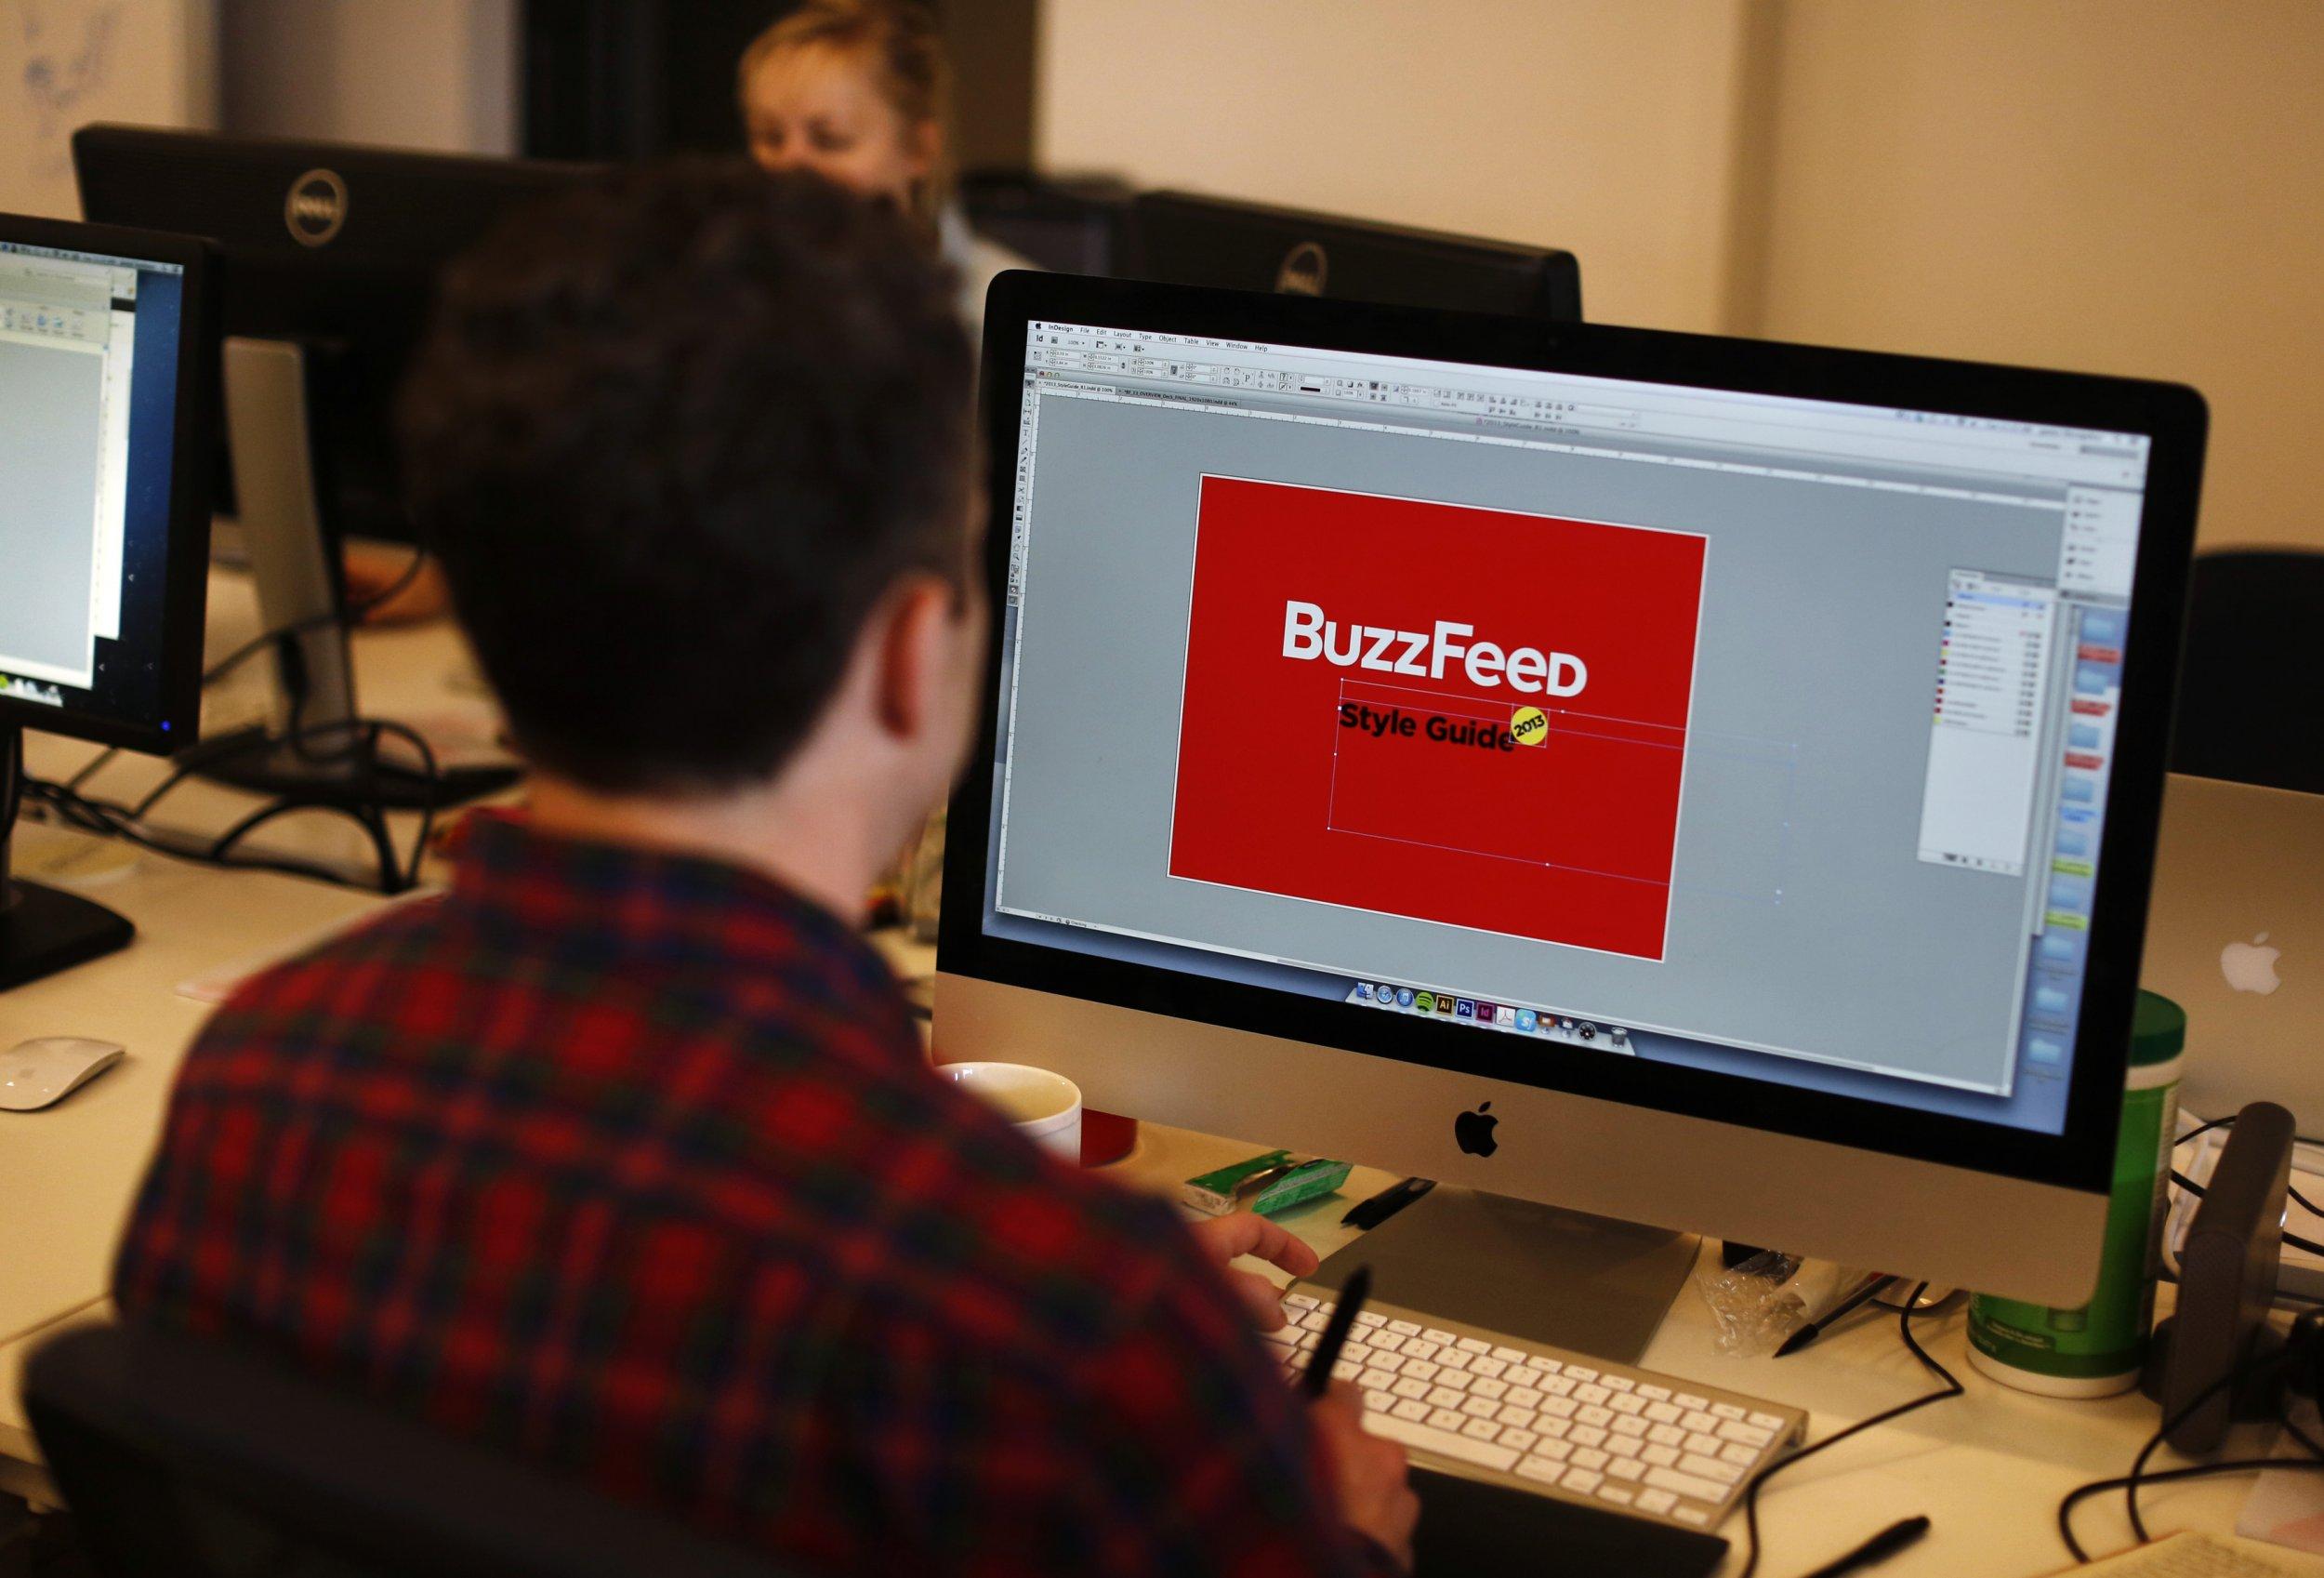 04_27_Buzzfeed_Screen_01